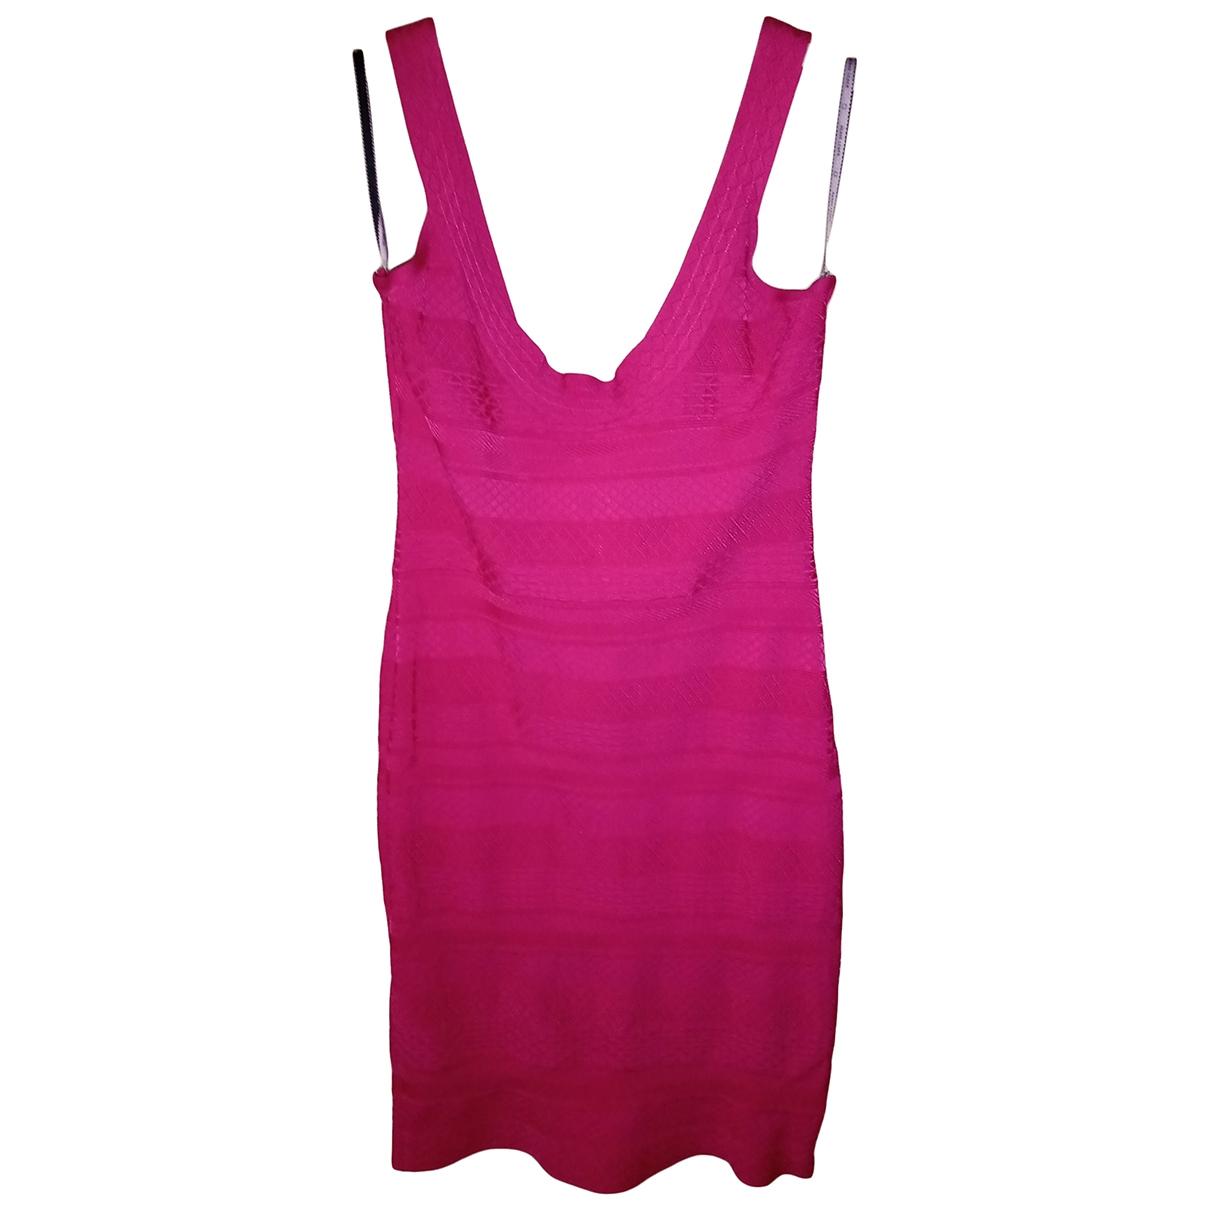 Herve Leger \N Pink dress for Women L International